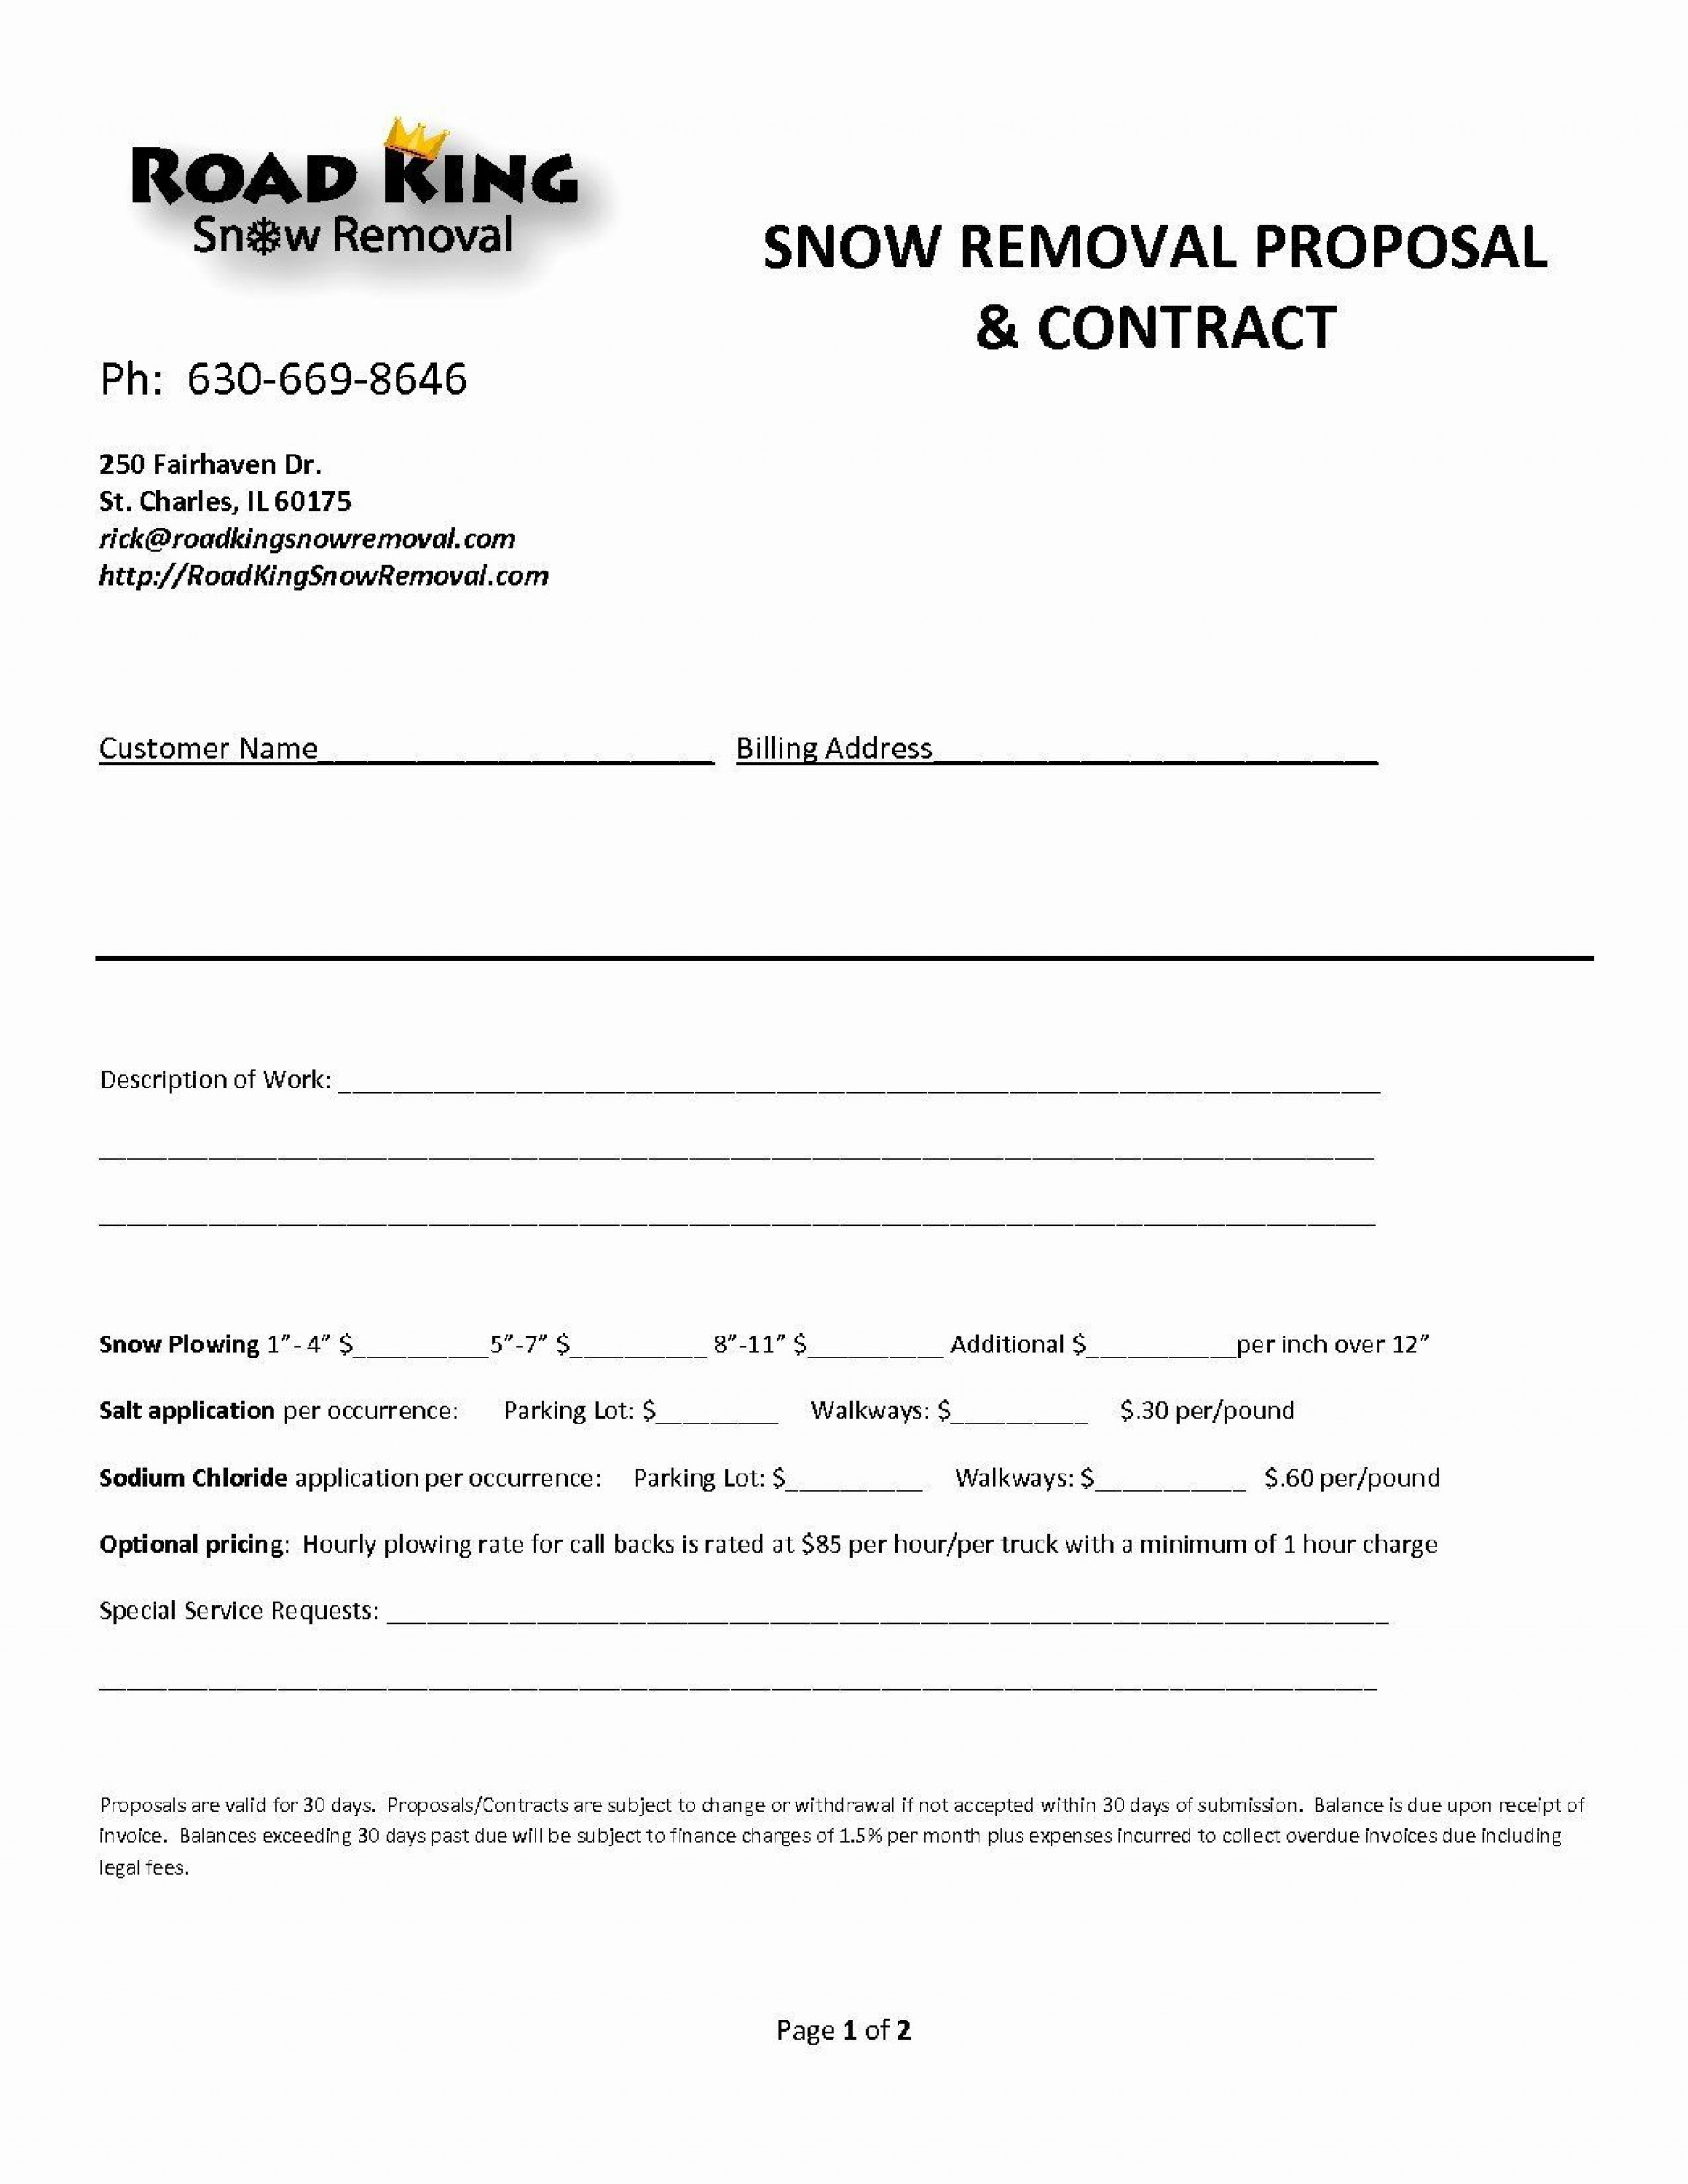 000 Singular Snow Removal Contract Template Sample  Templates Free Printable Simple Seasonal Plow Agreement1920